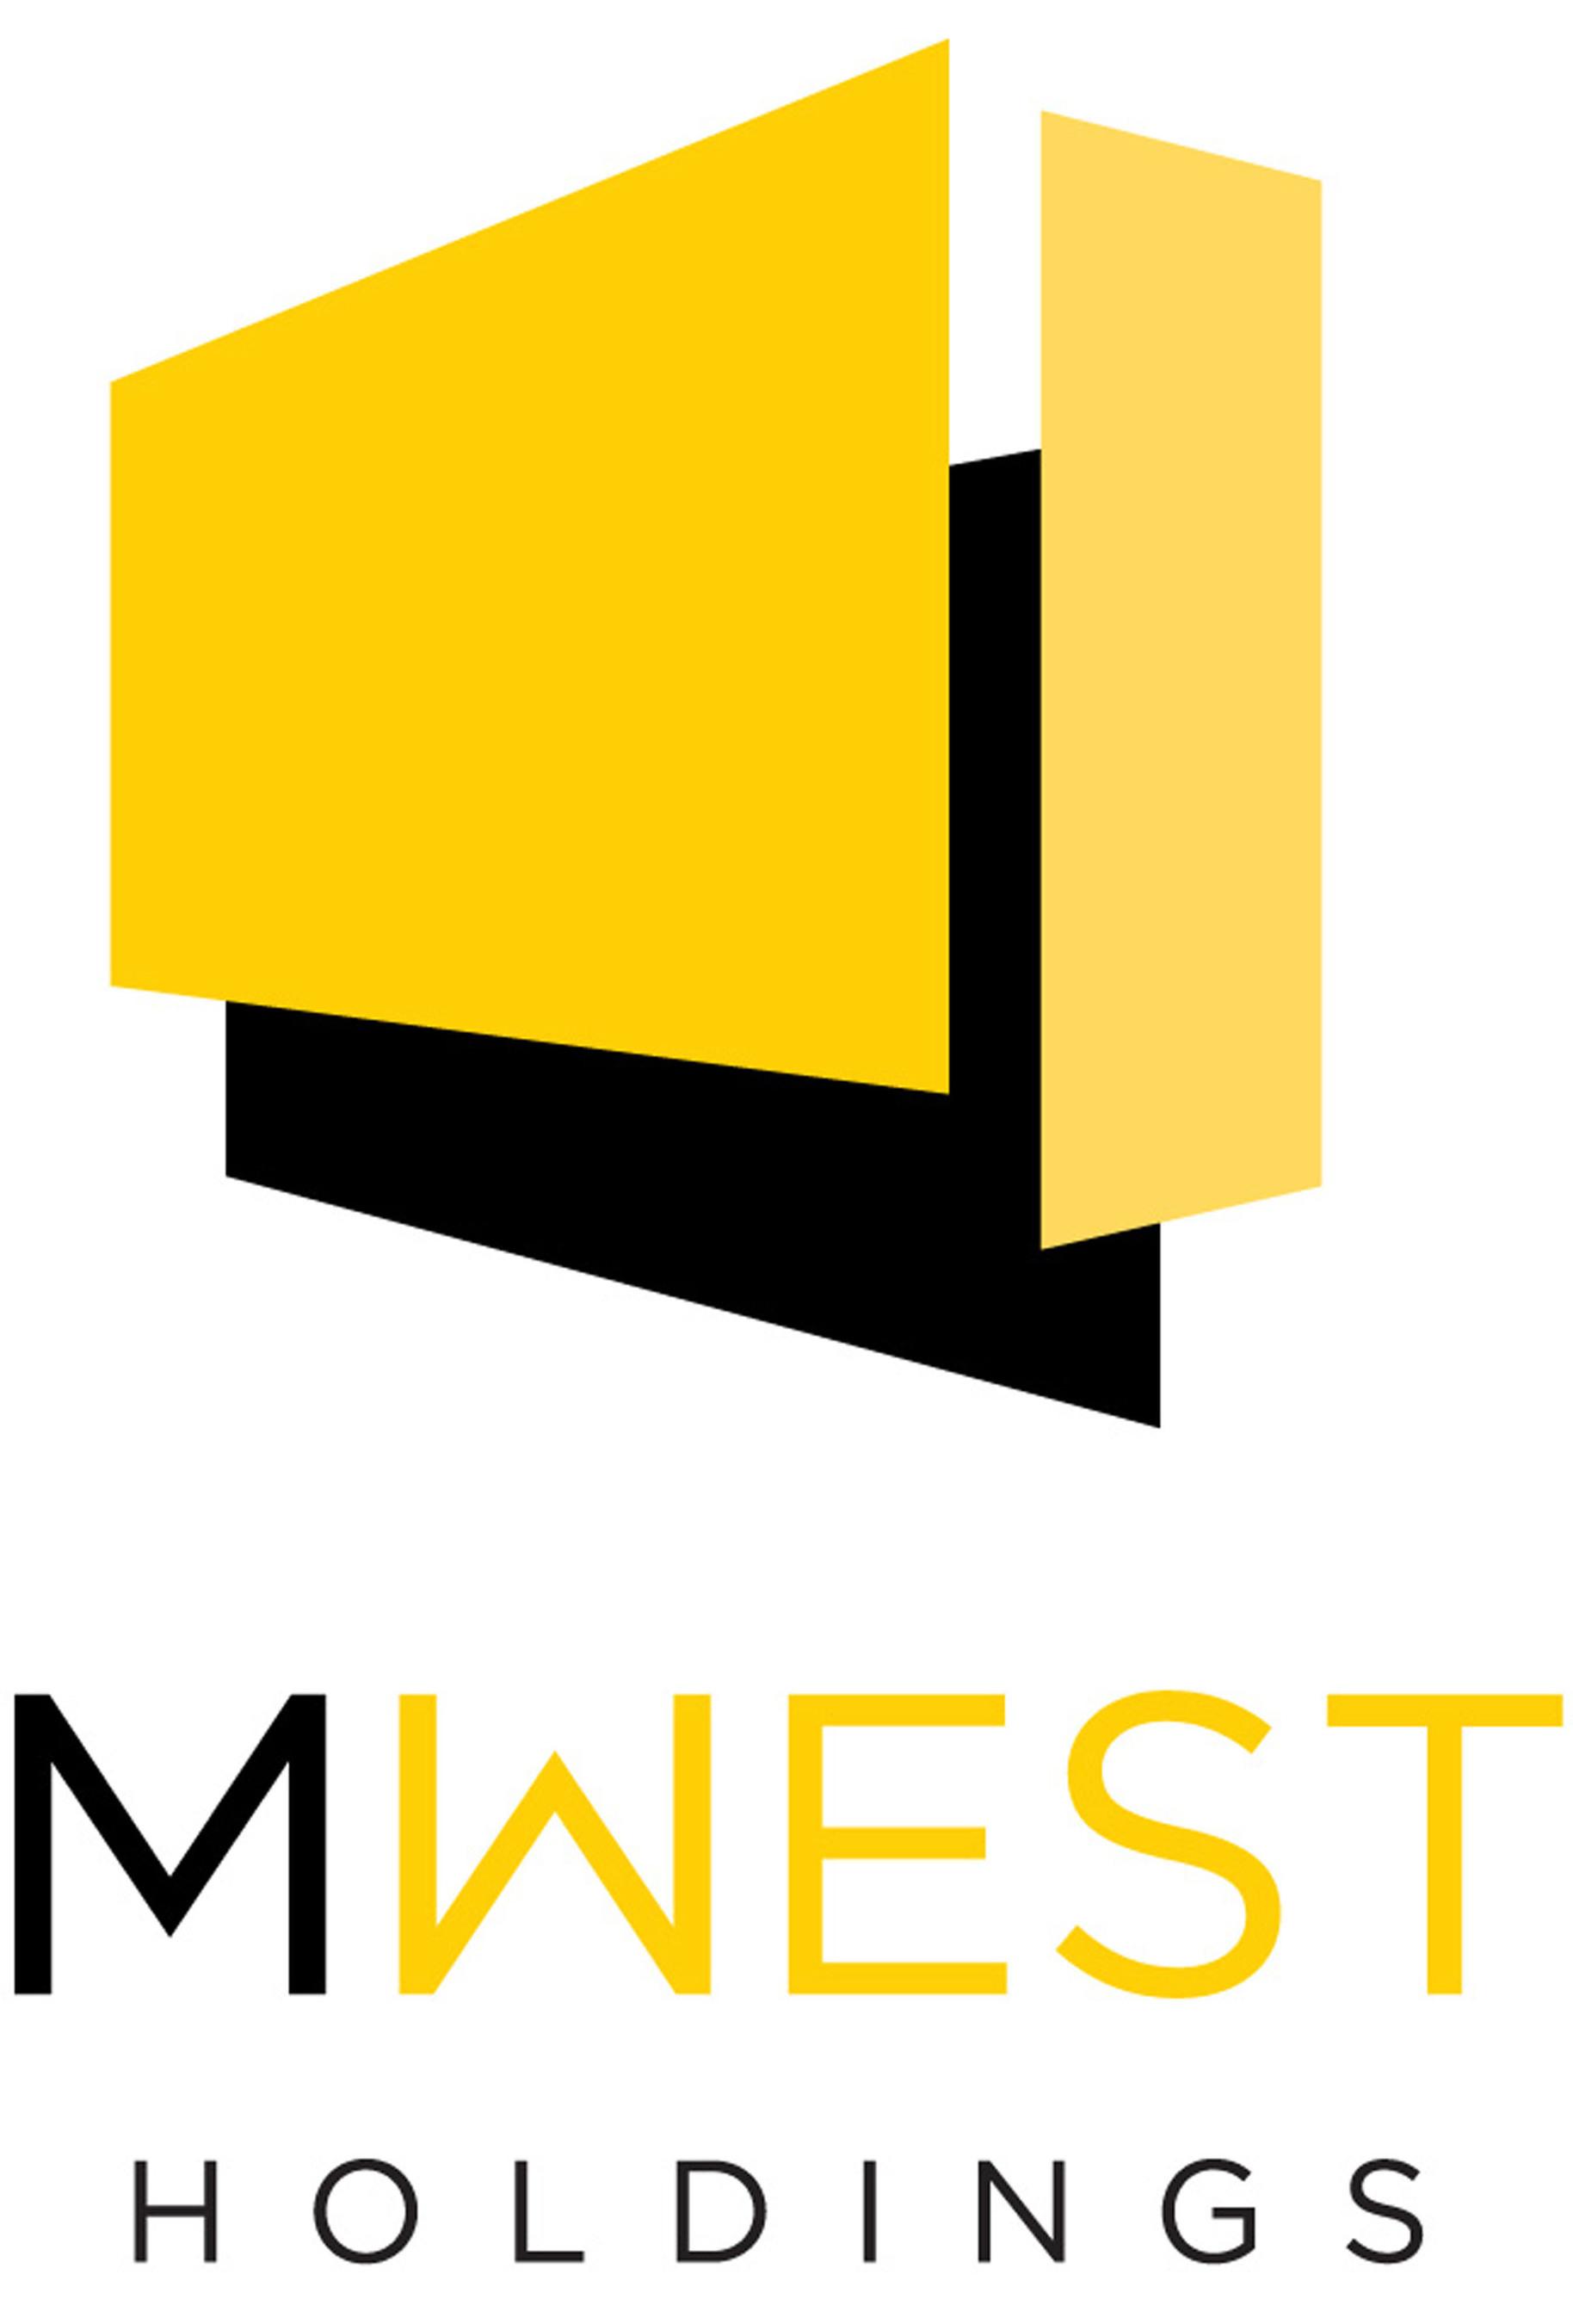 M West Holdings Logo.